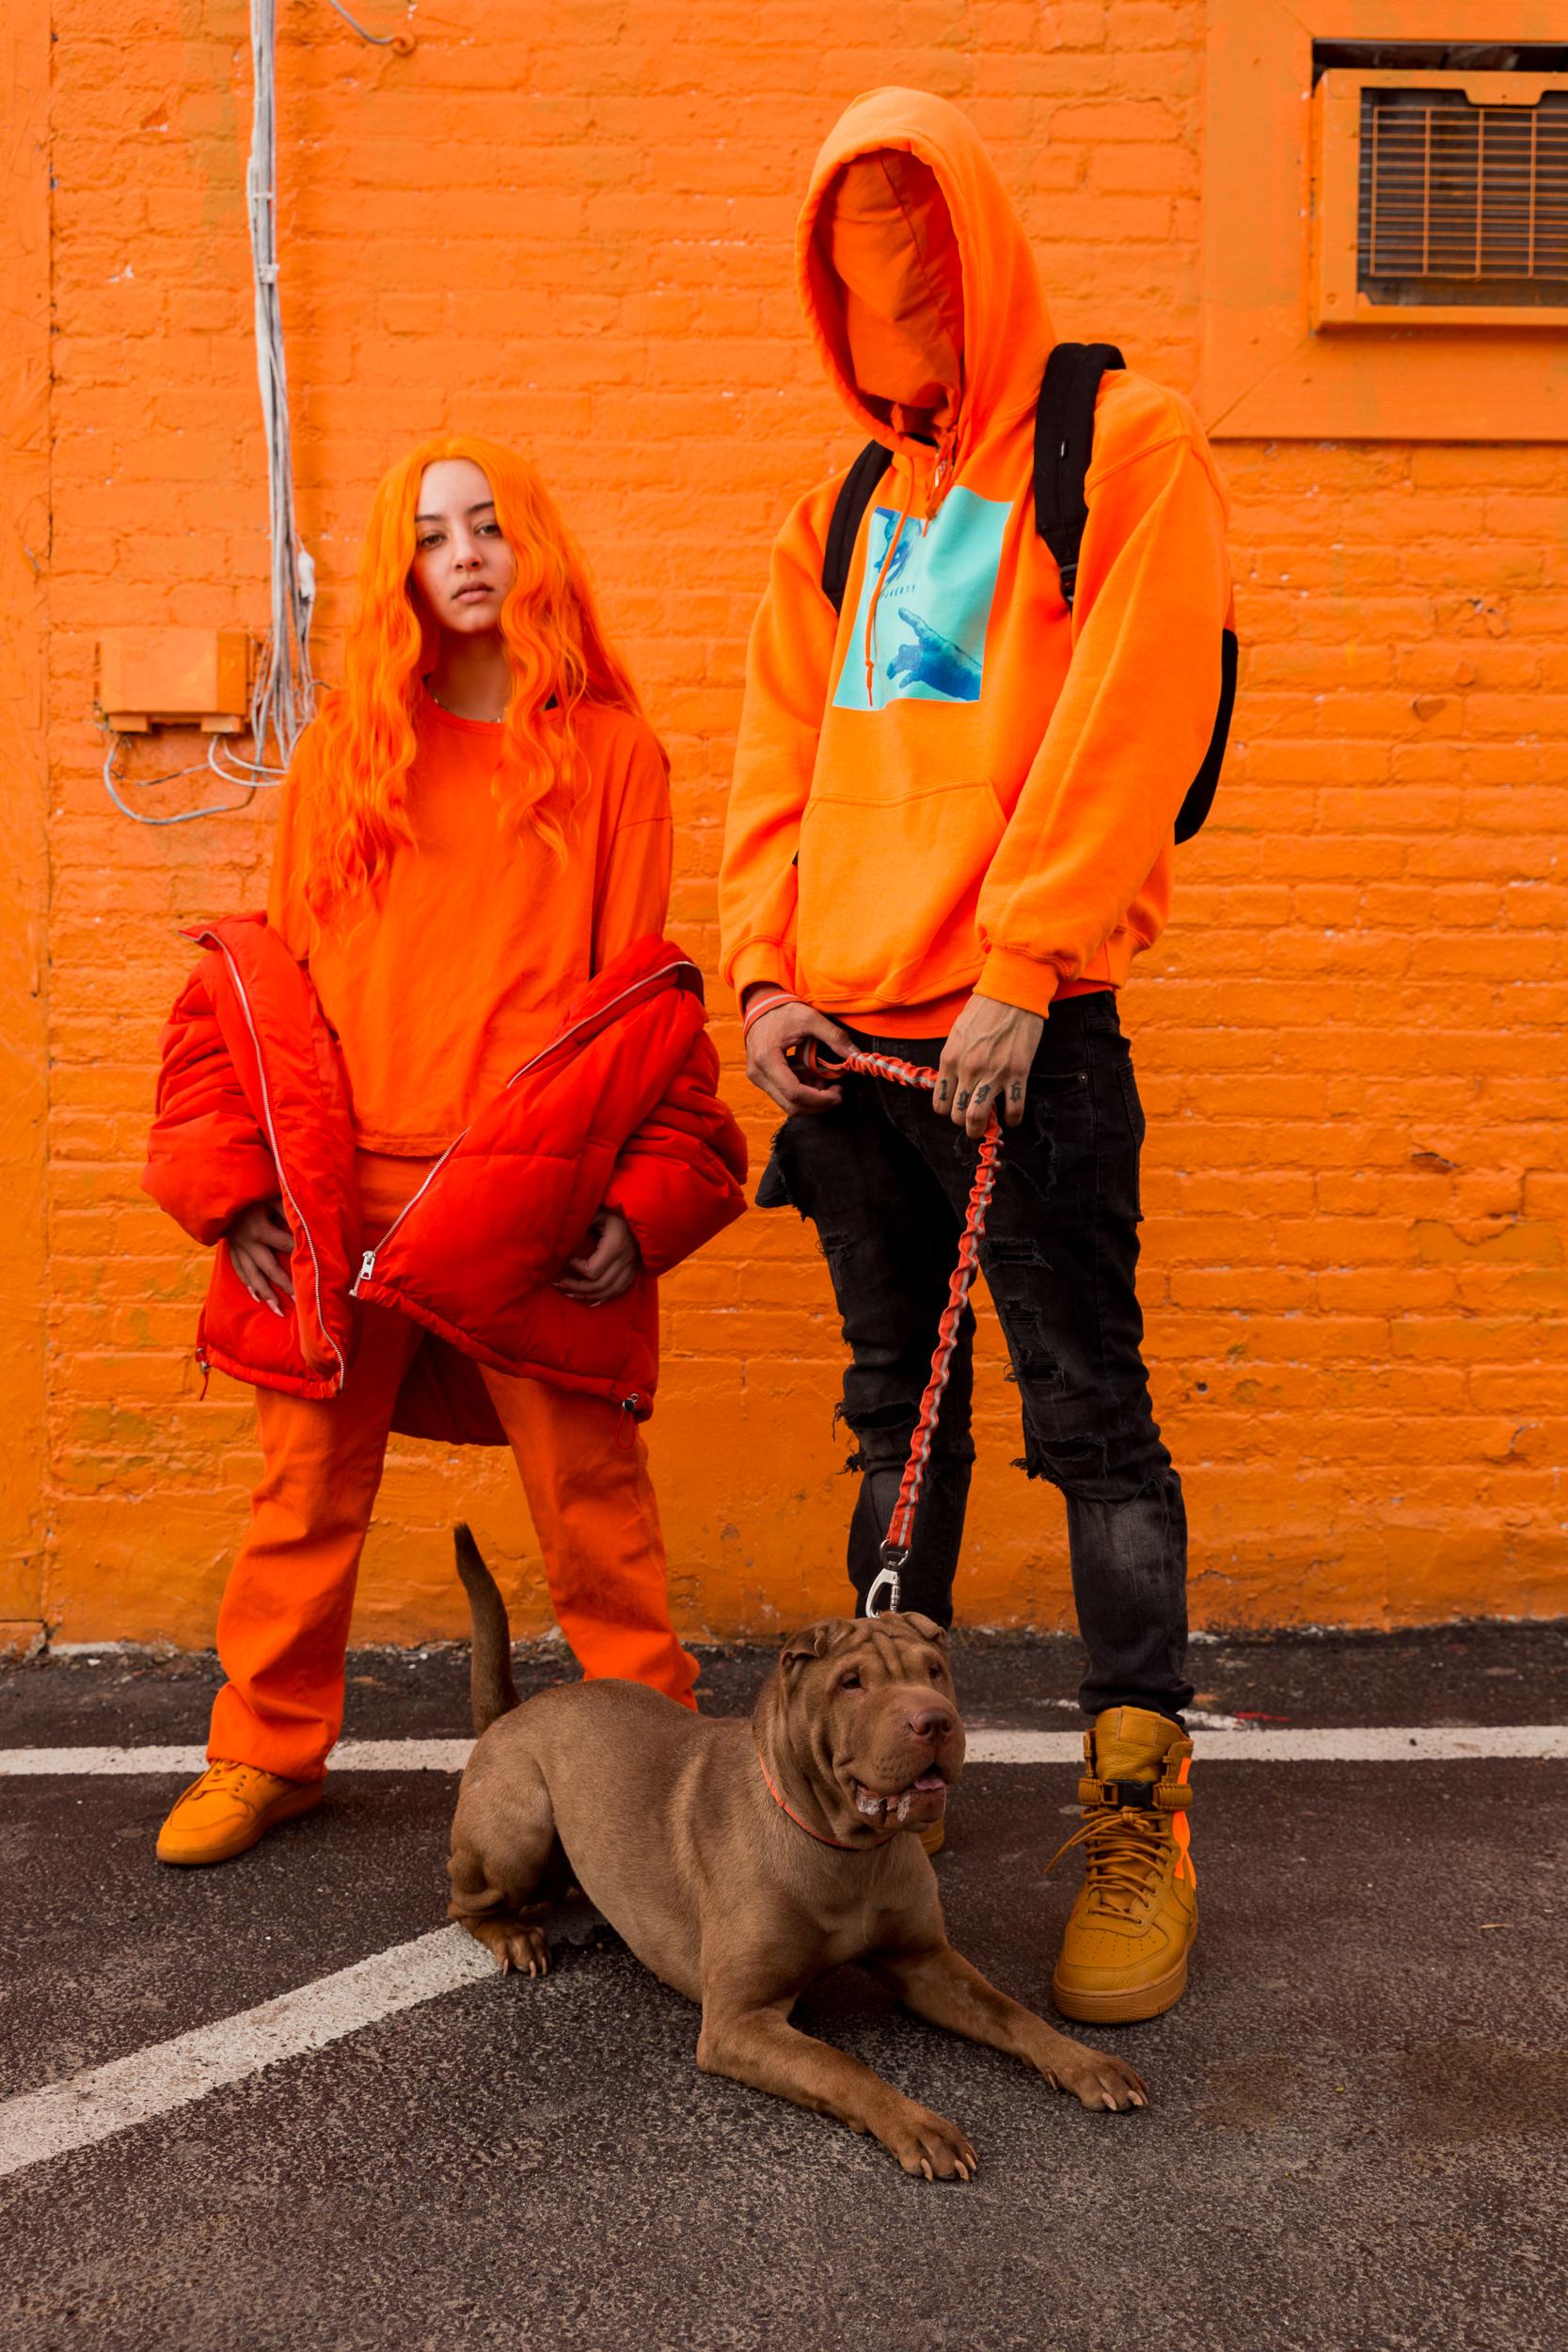 Color theme: Orange